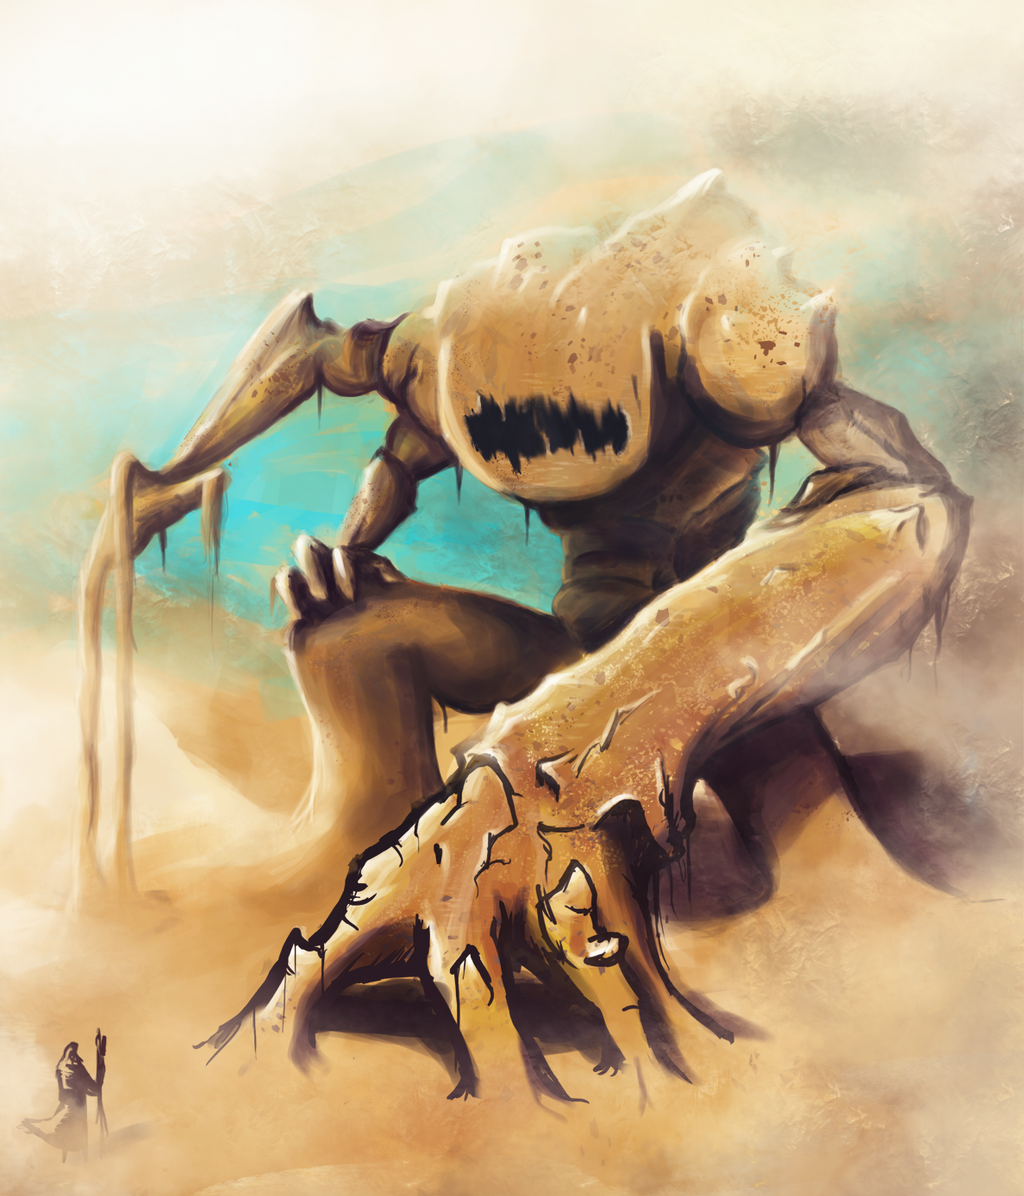 Sandstorm colossus by kiynley